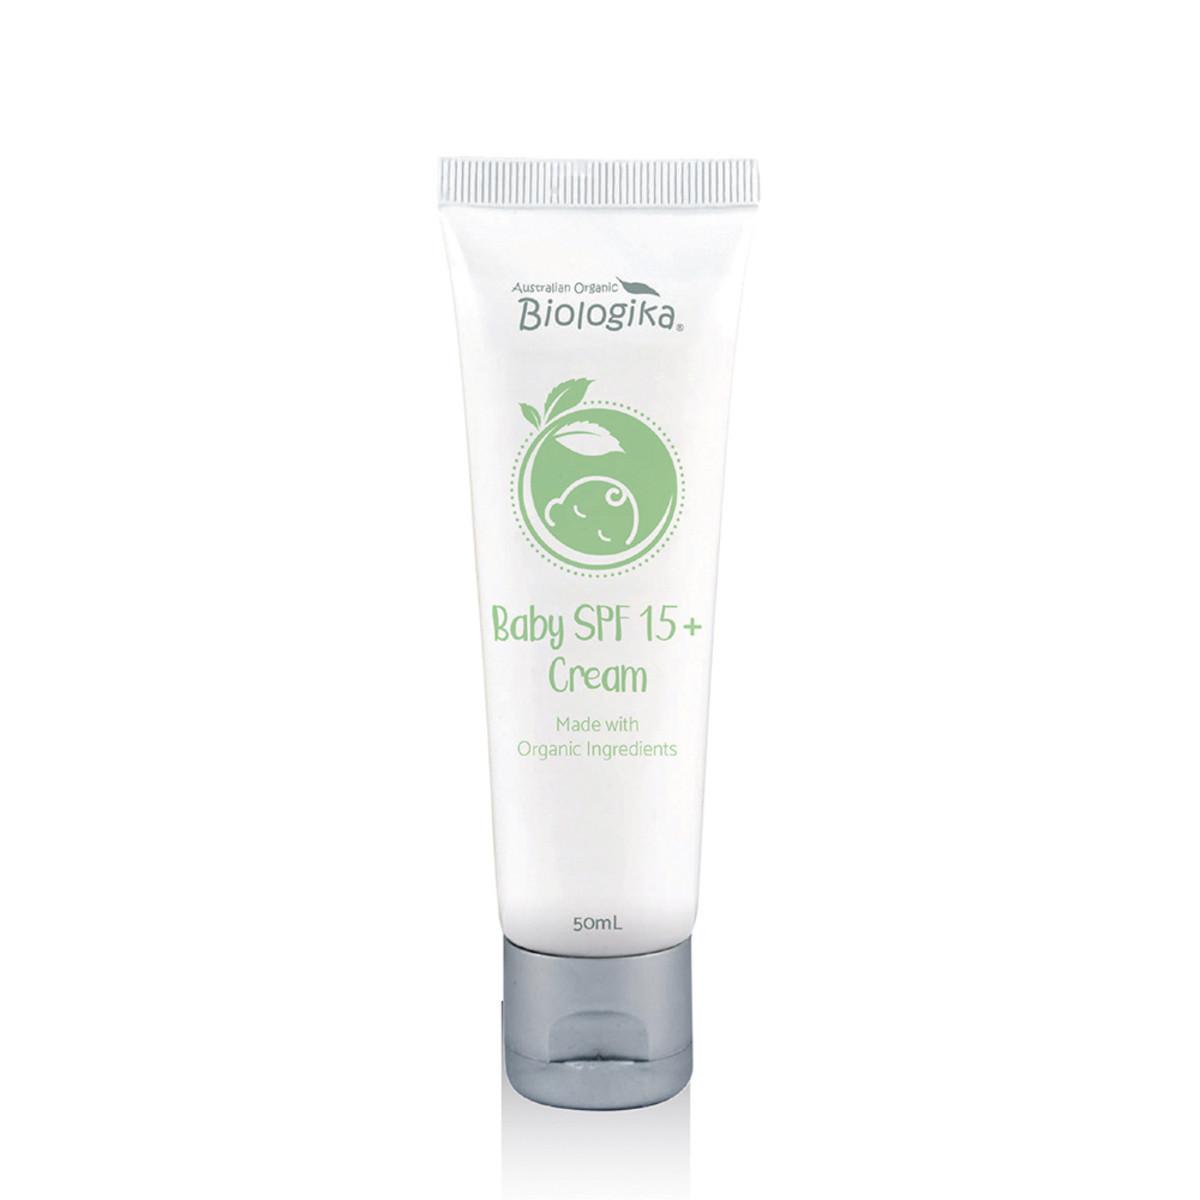 Biologika Baby SPF 15 Cream